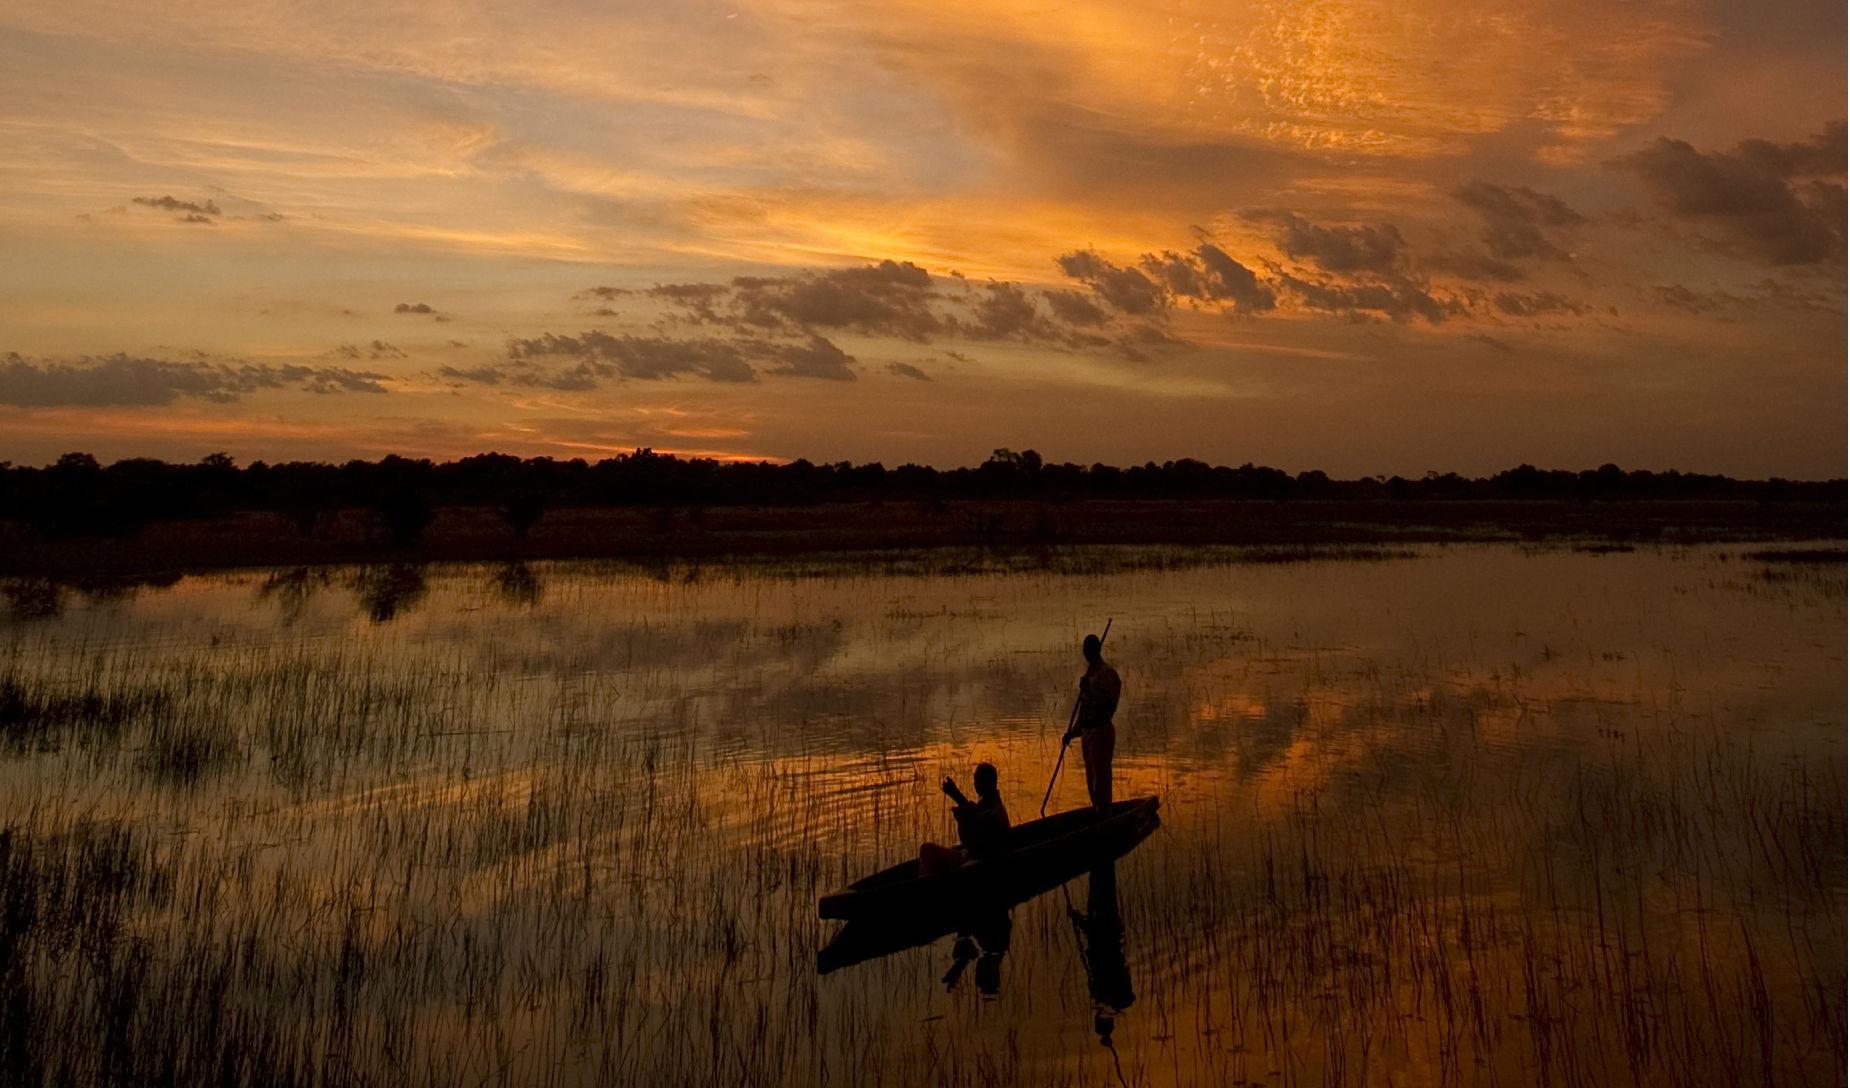 Luxury camp in Botswana